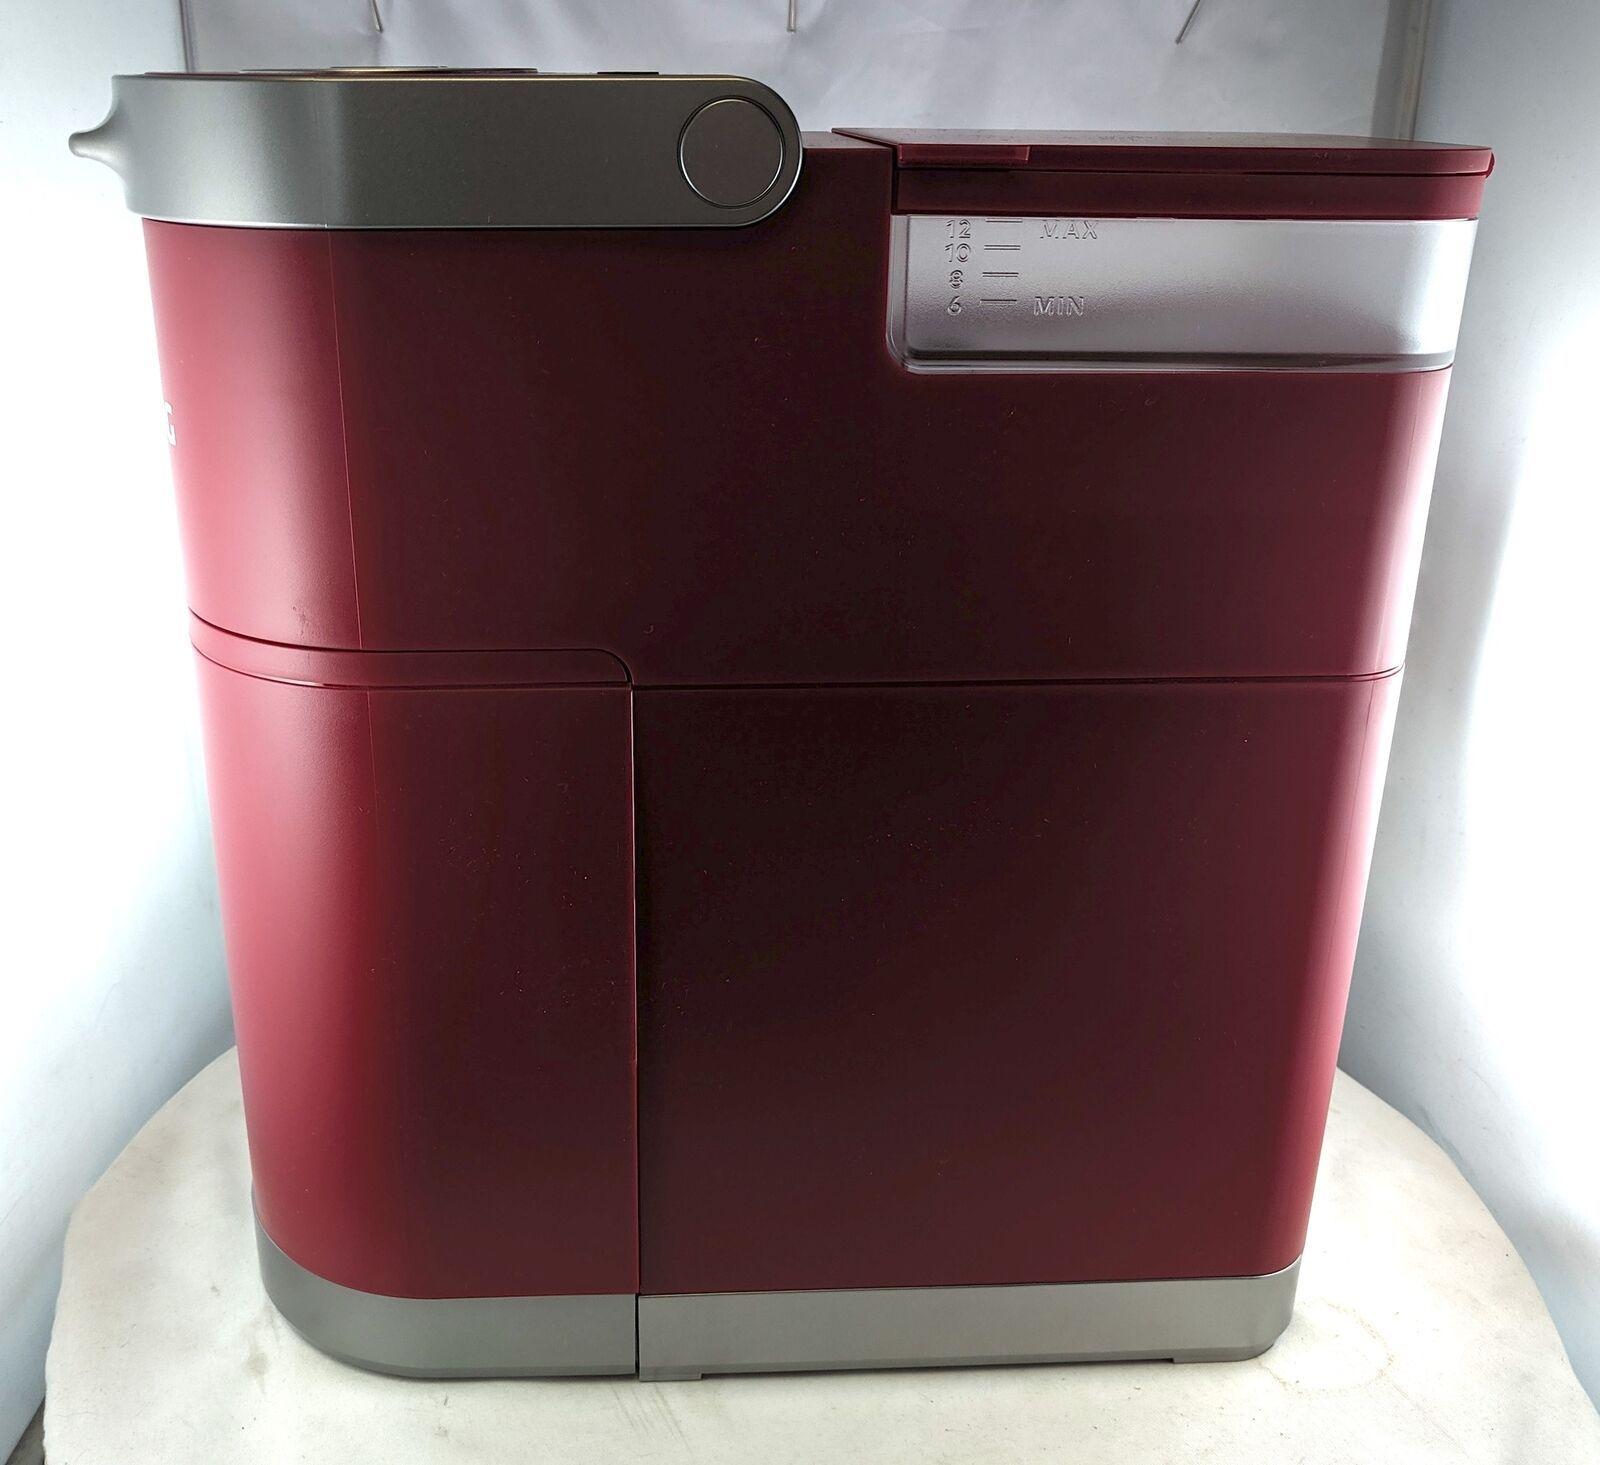 Keurig KMini Plus with Pod Storage Red Ideas of Keurig